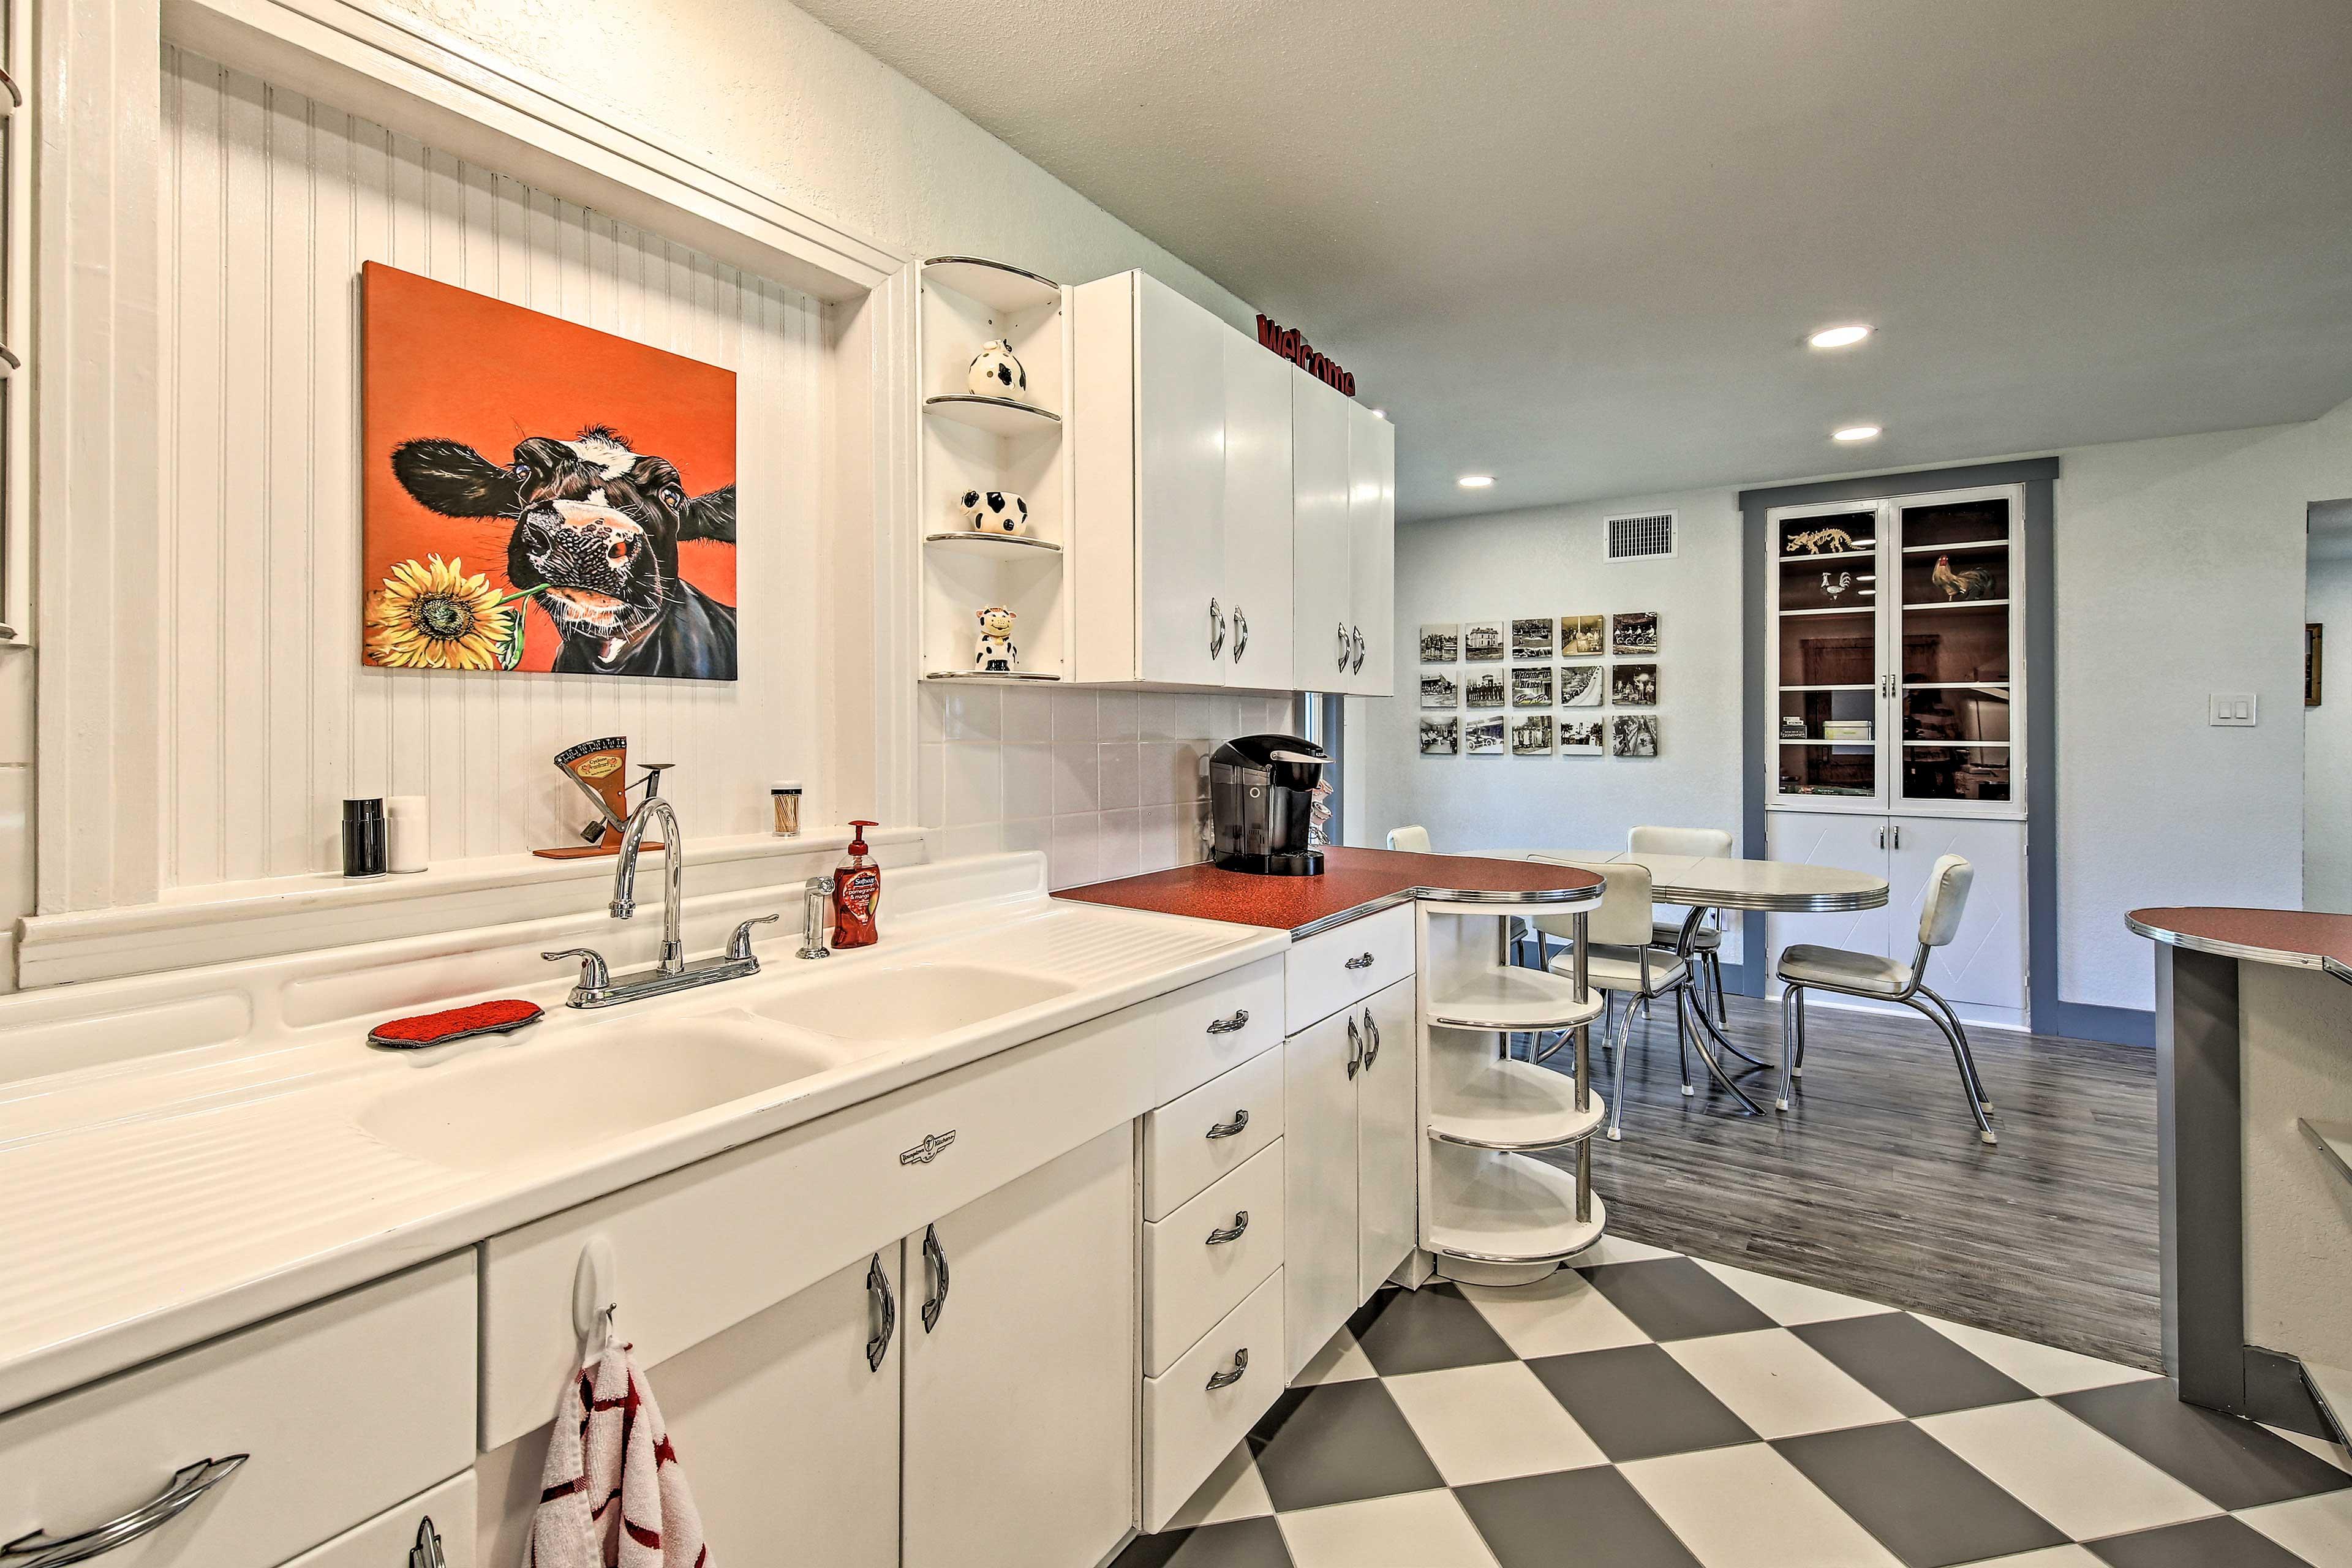 Take advantage of this fully stocked kitchen!